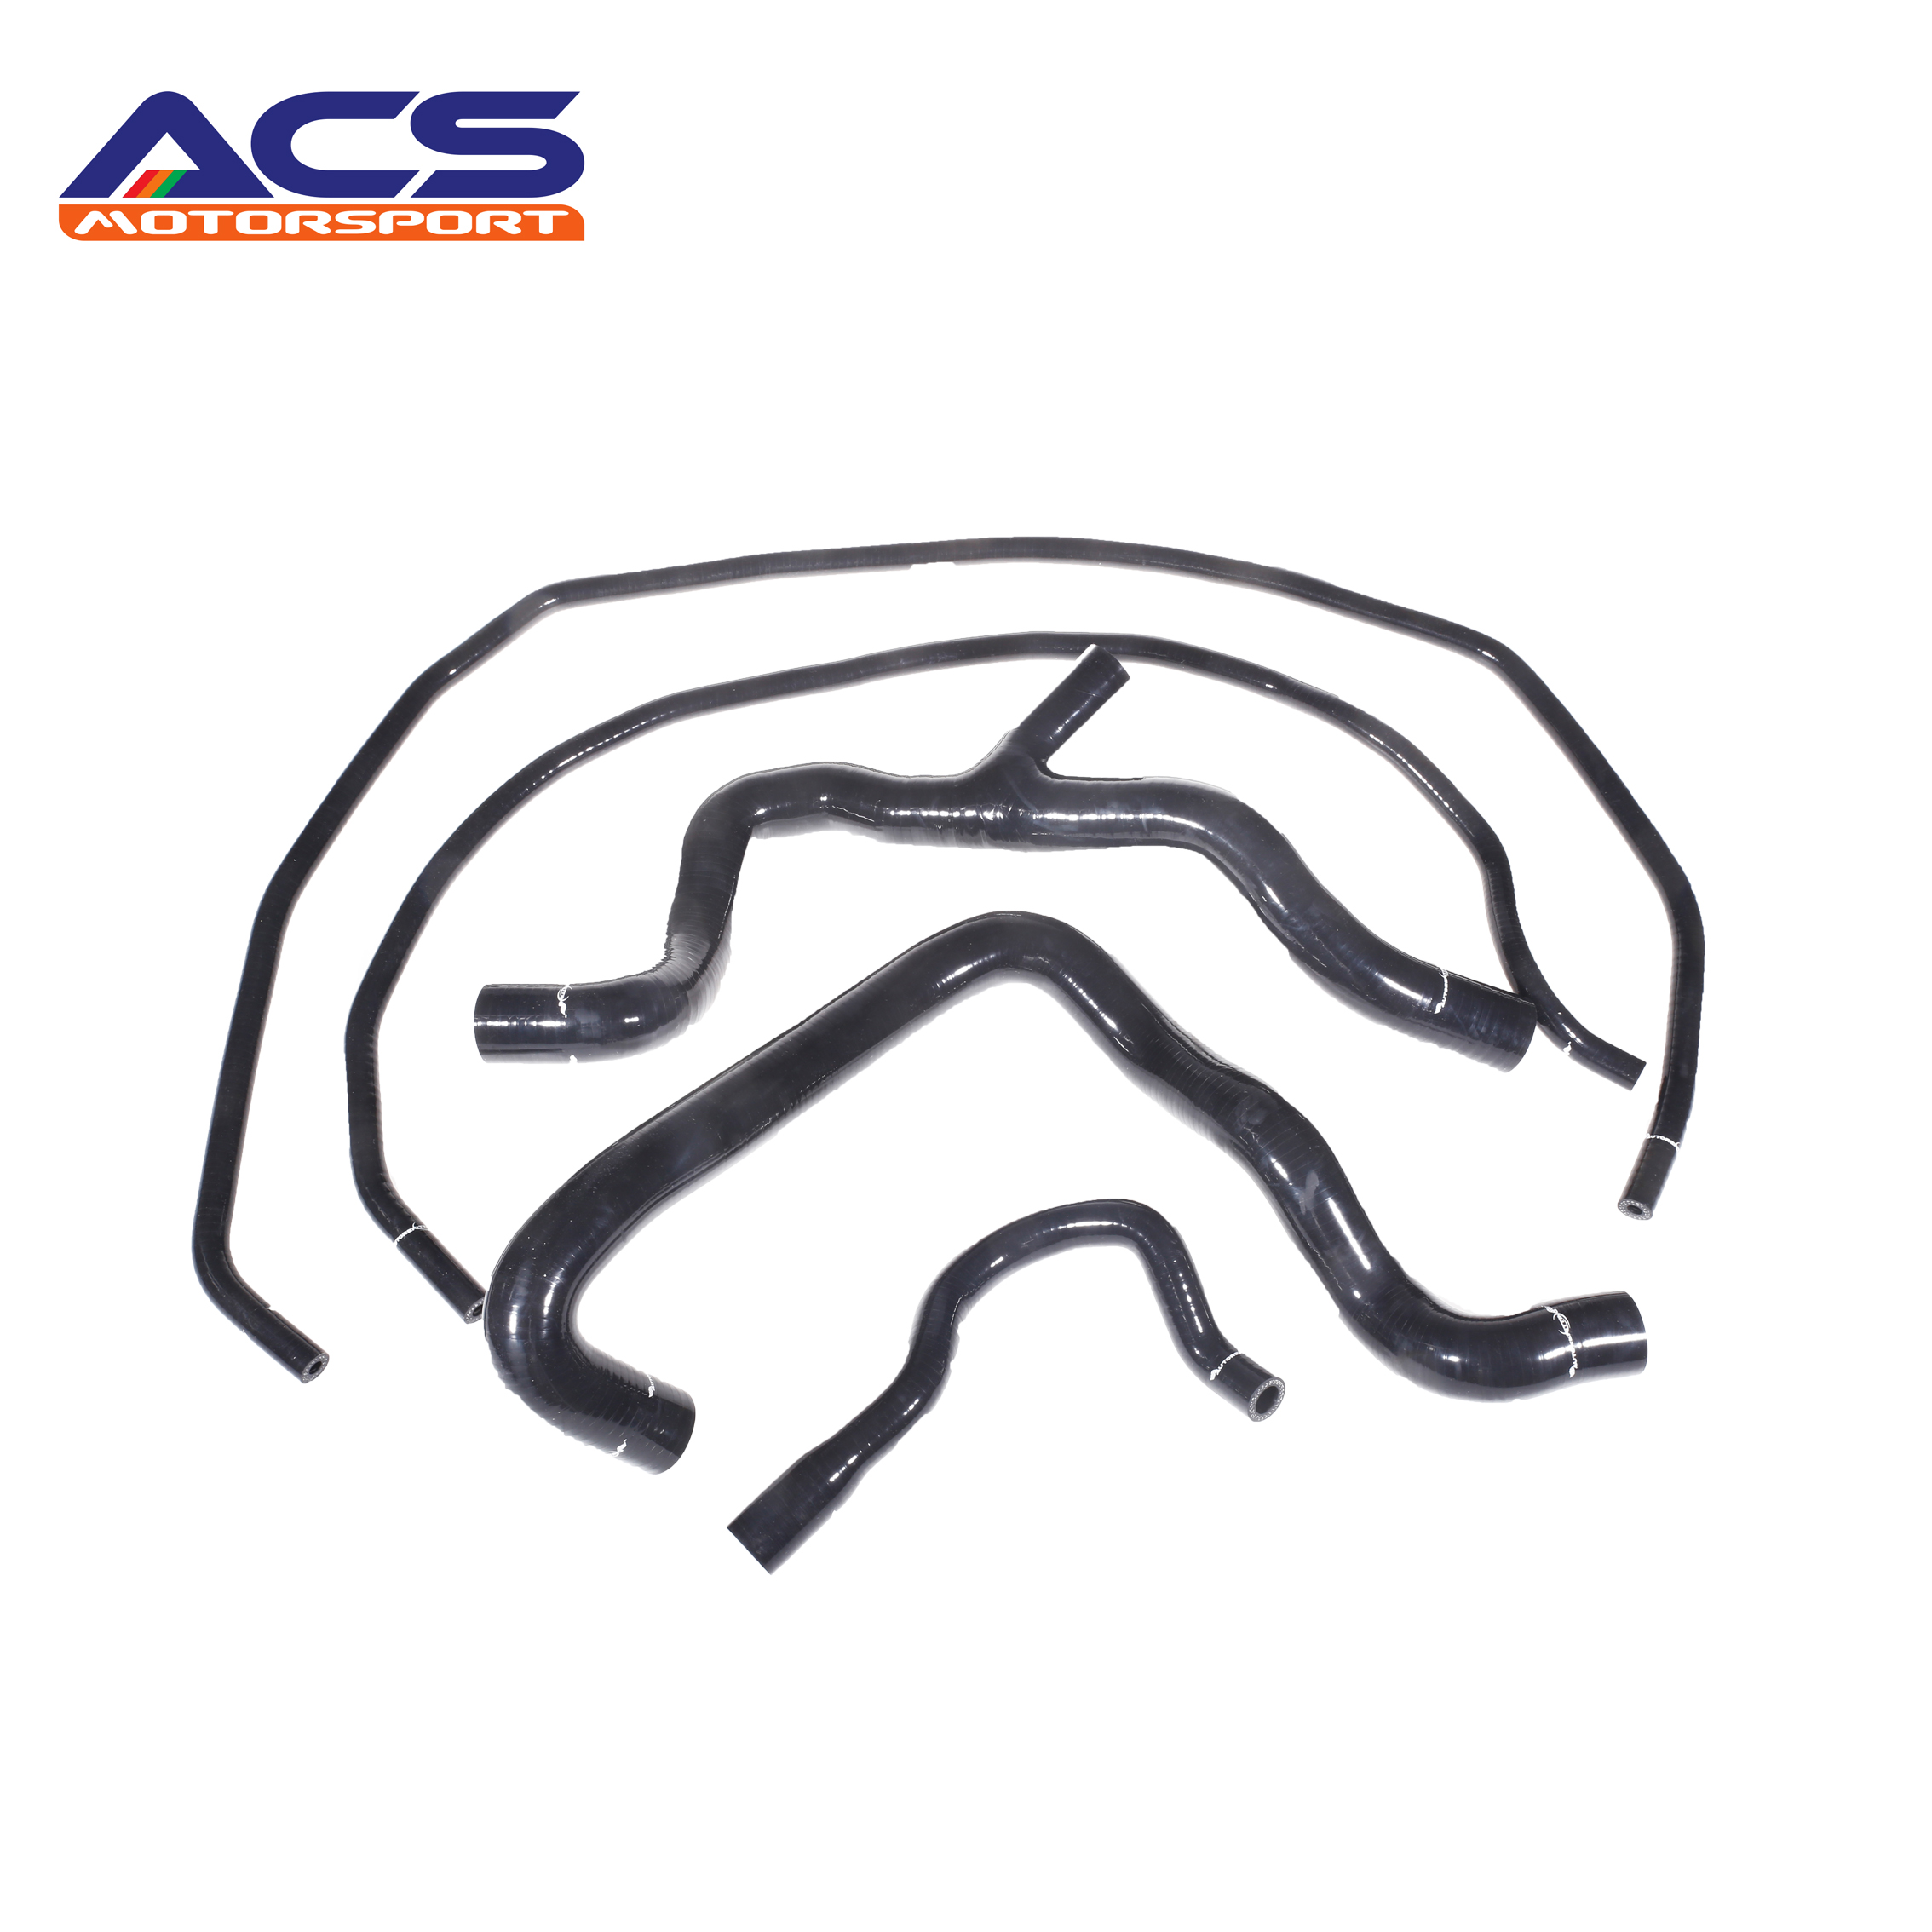 Universal Black Silicone Coolant Hose Kit For Ford ST 225 genuine 30723084 engine coolant hose